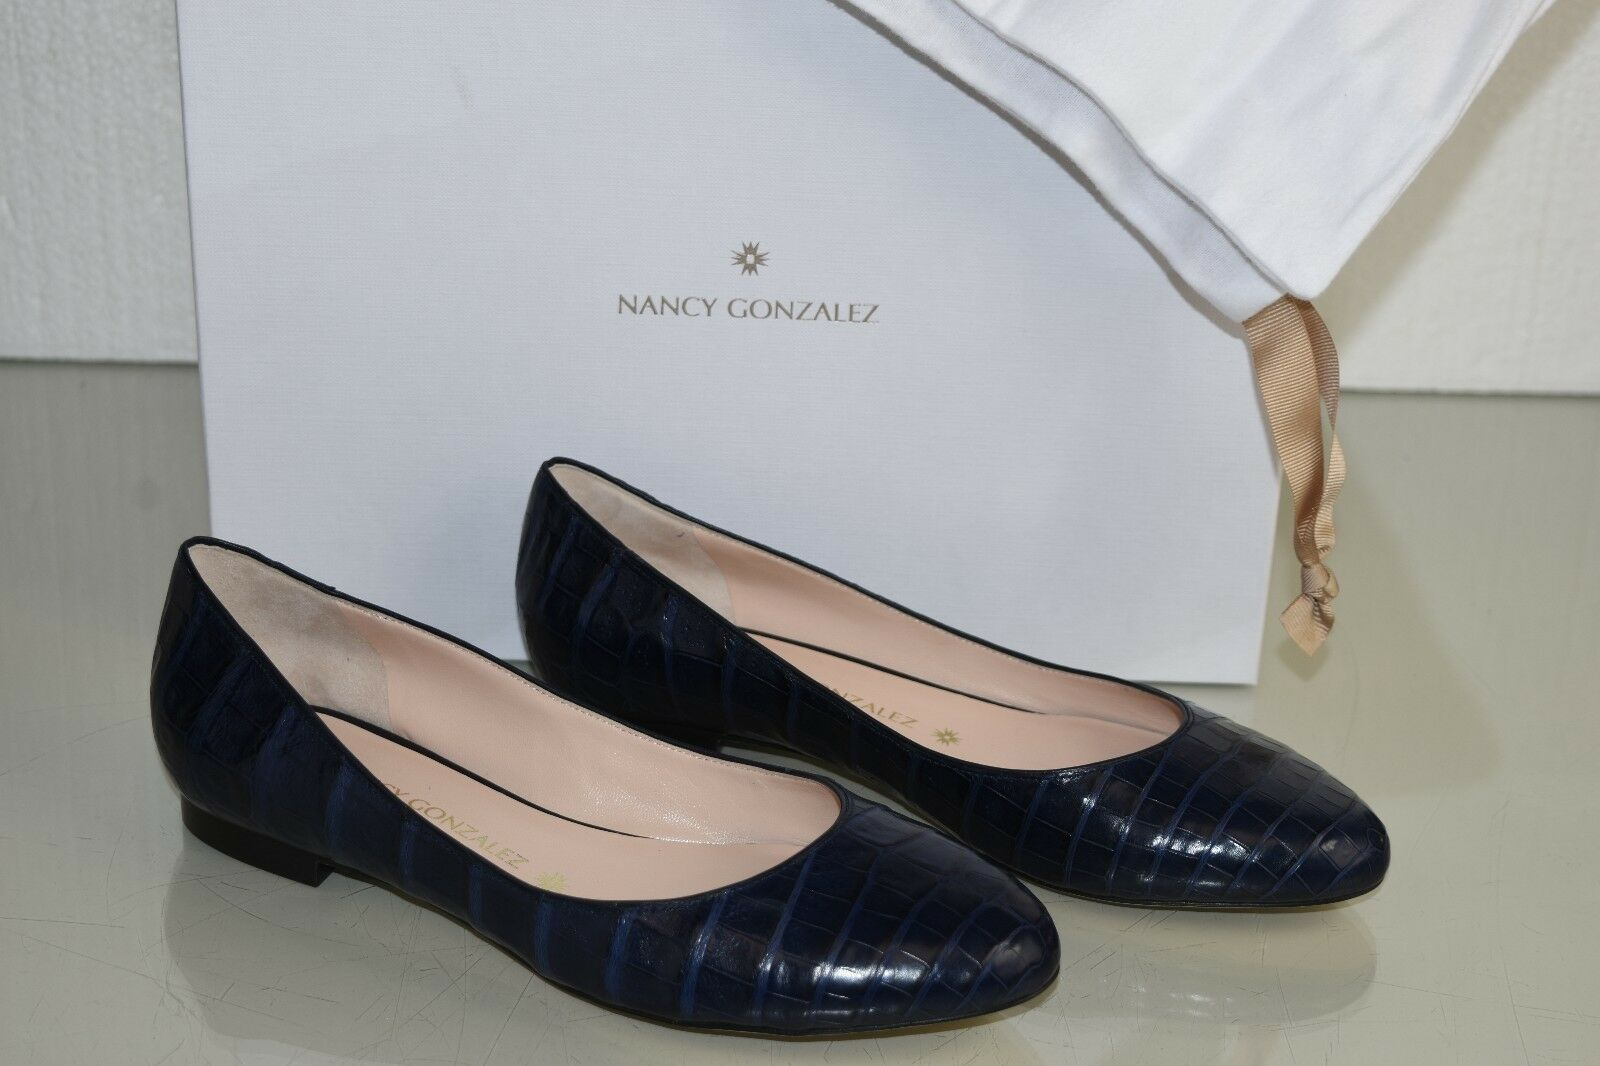 Nuevo Nancy Gonzalez Cristina Lagarto Lagarto Lagarto Cocodrilo Azul Marino Zapato Plano 39 41  varios tamaños